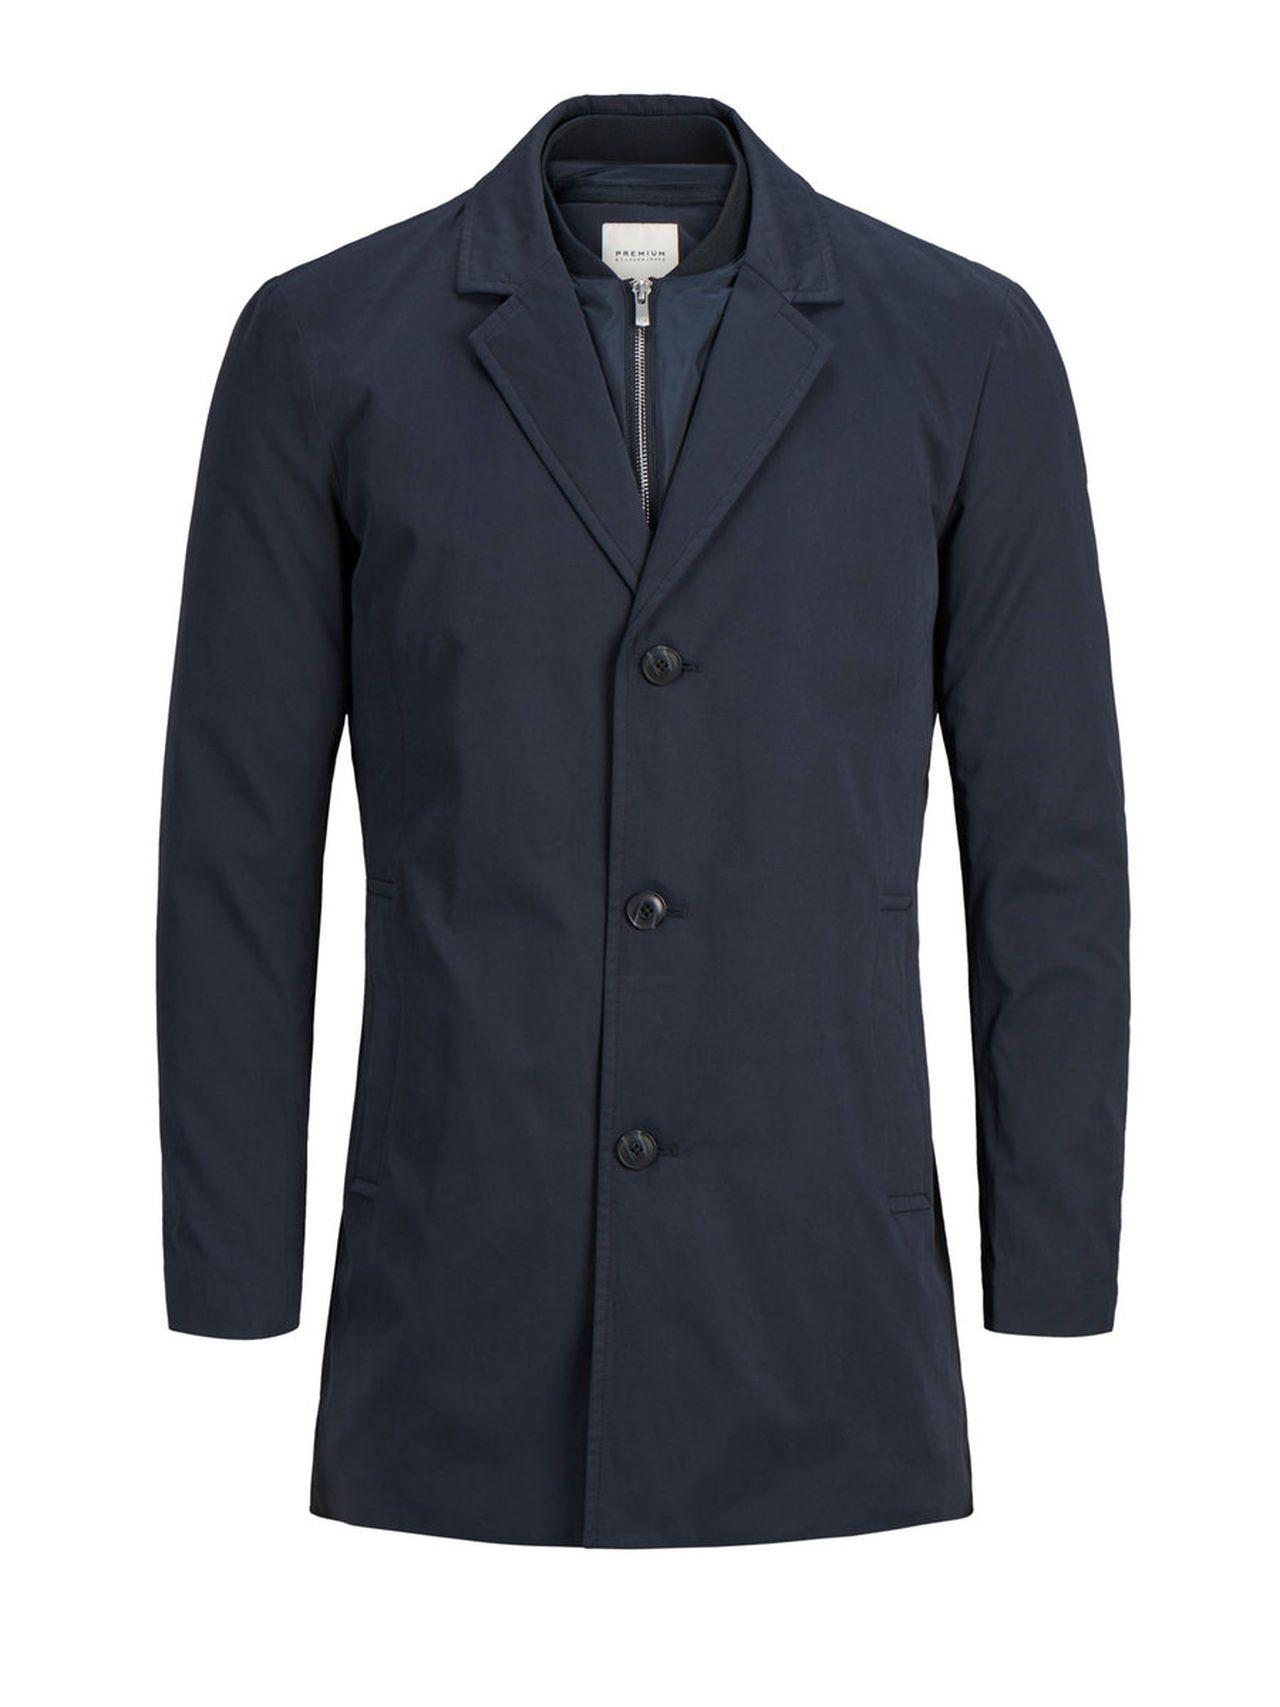 Jackandjones Lassiger Mantel Herren Blau 5713723799360 Mode Ootd Outfit Fashion Style Online Jack Jones Lassiger Man Mantel Herren Mantel Herrin